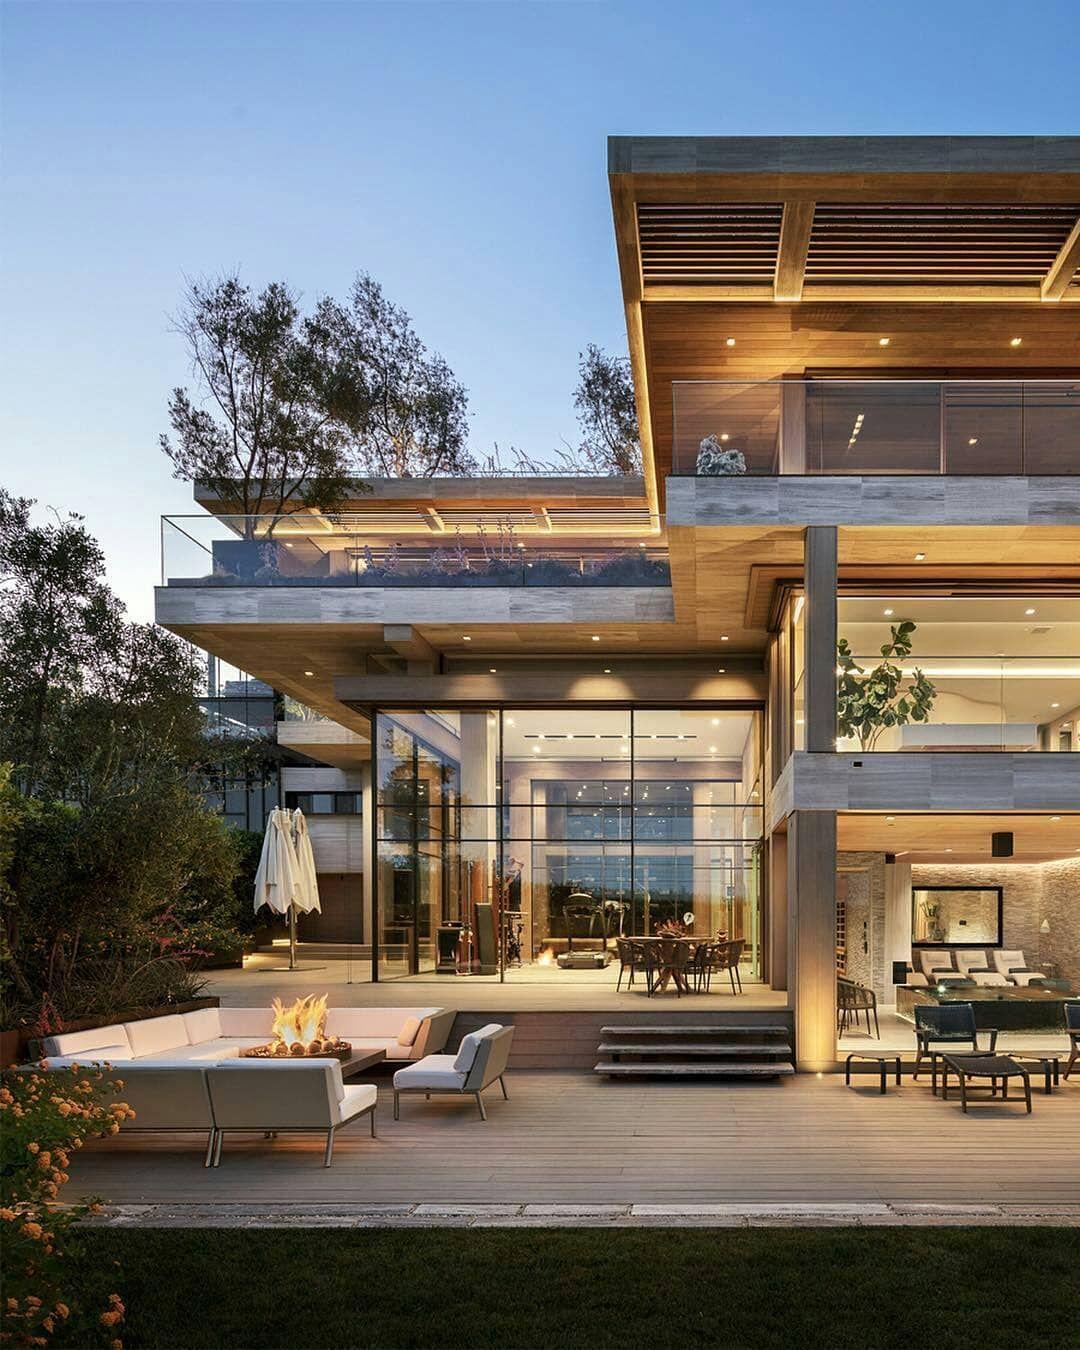 La Mia Casa Group sarbonne residence designed by arya group in bel-air